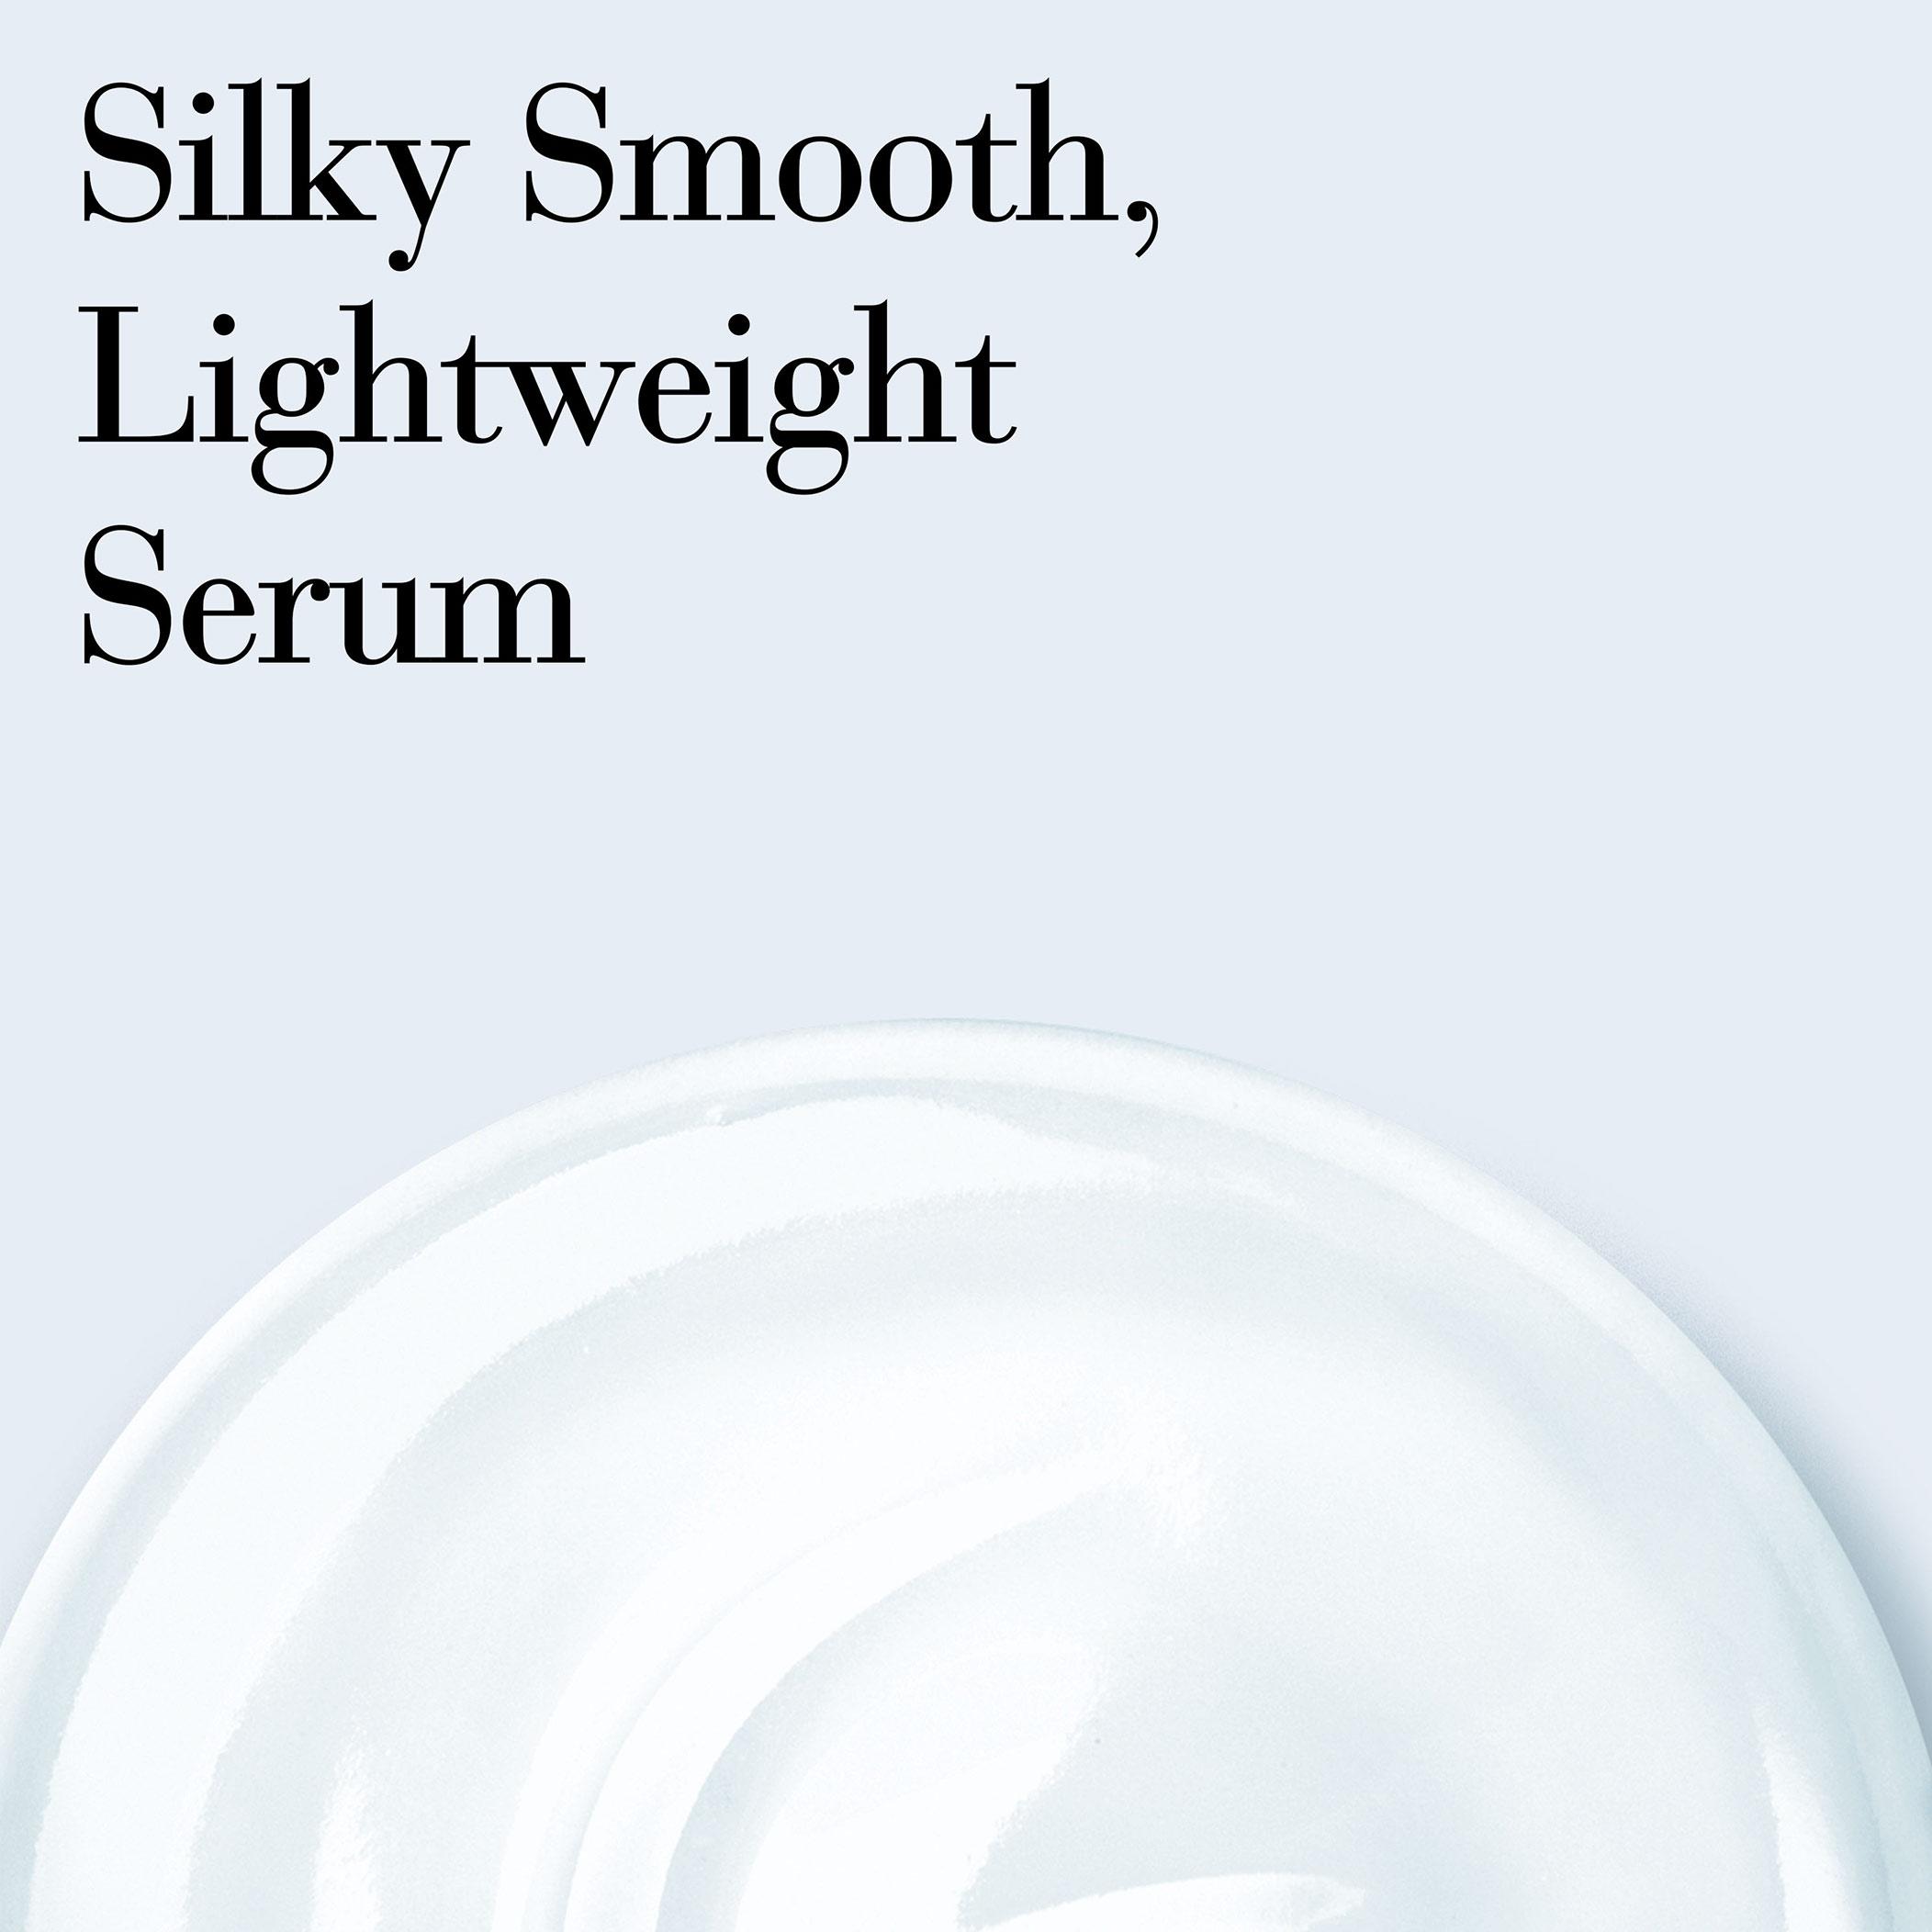 Texture is Silky Smooth, Lightweight Serum